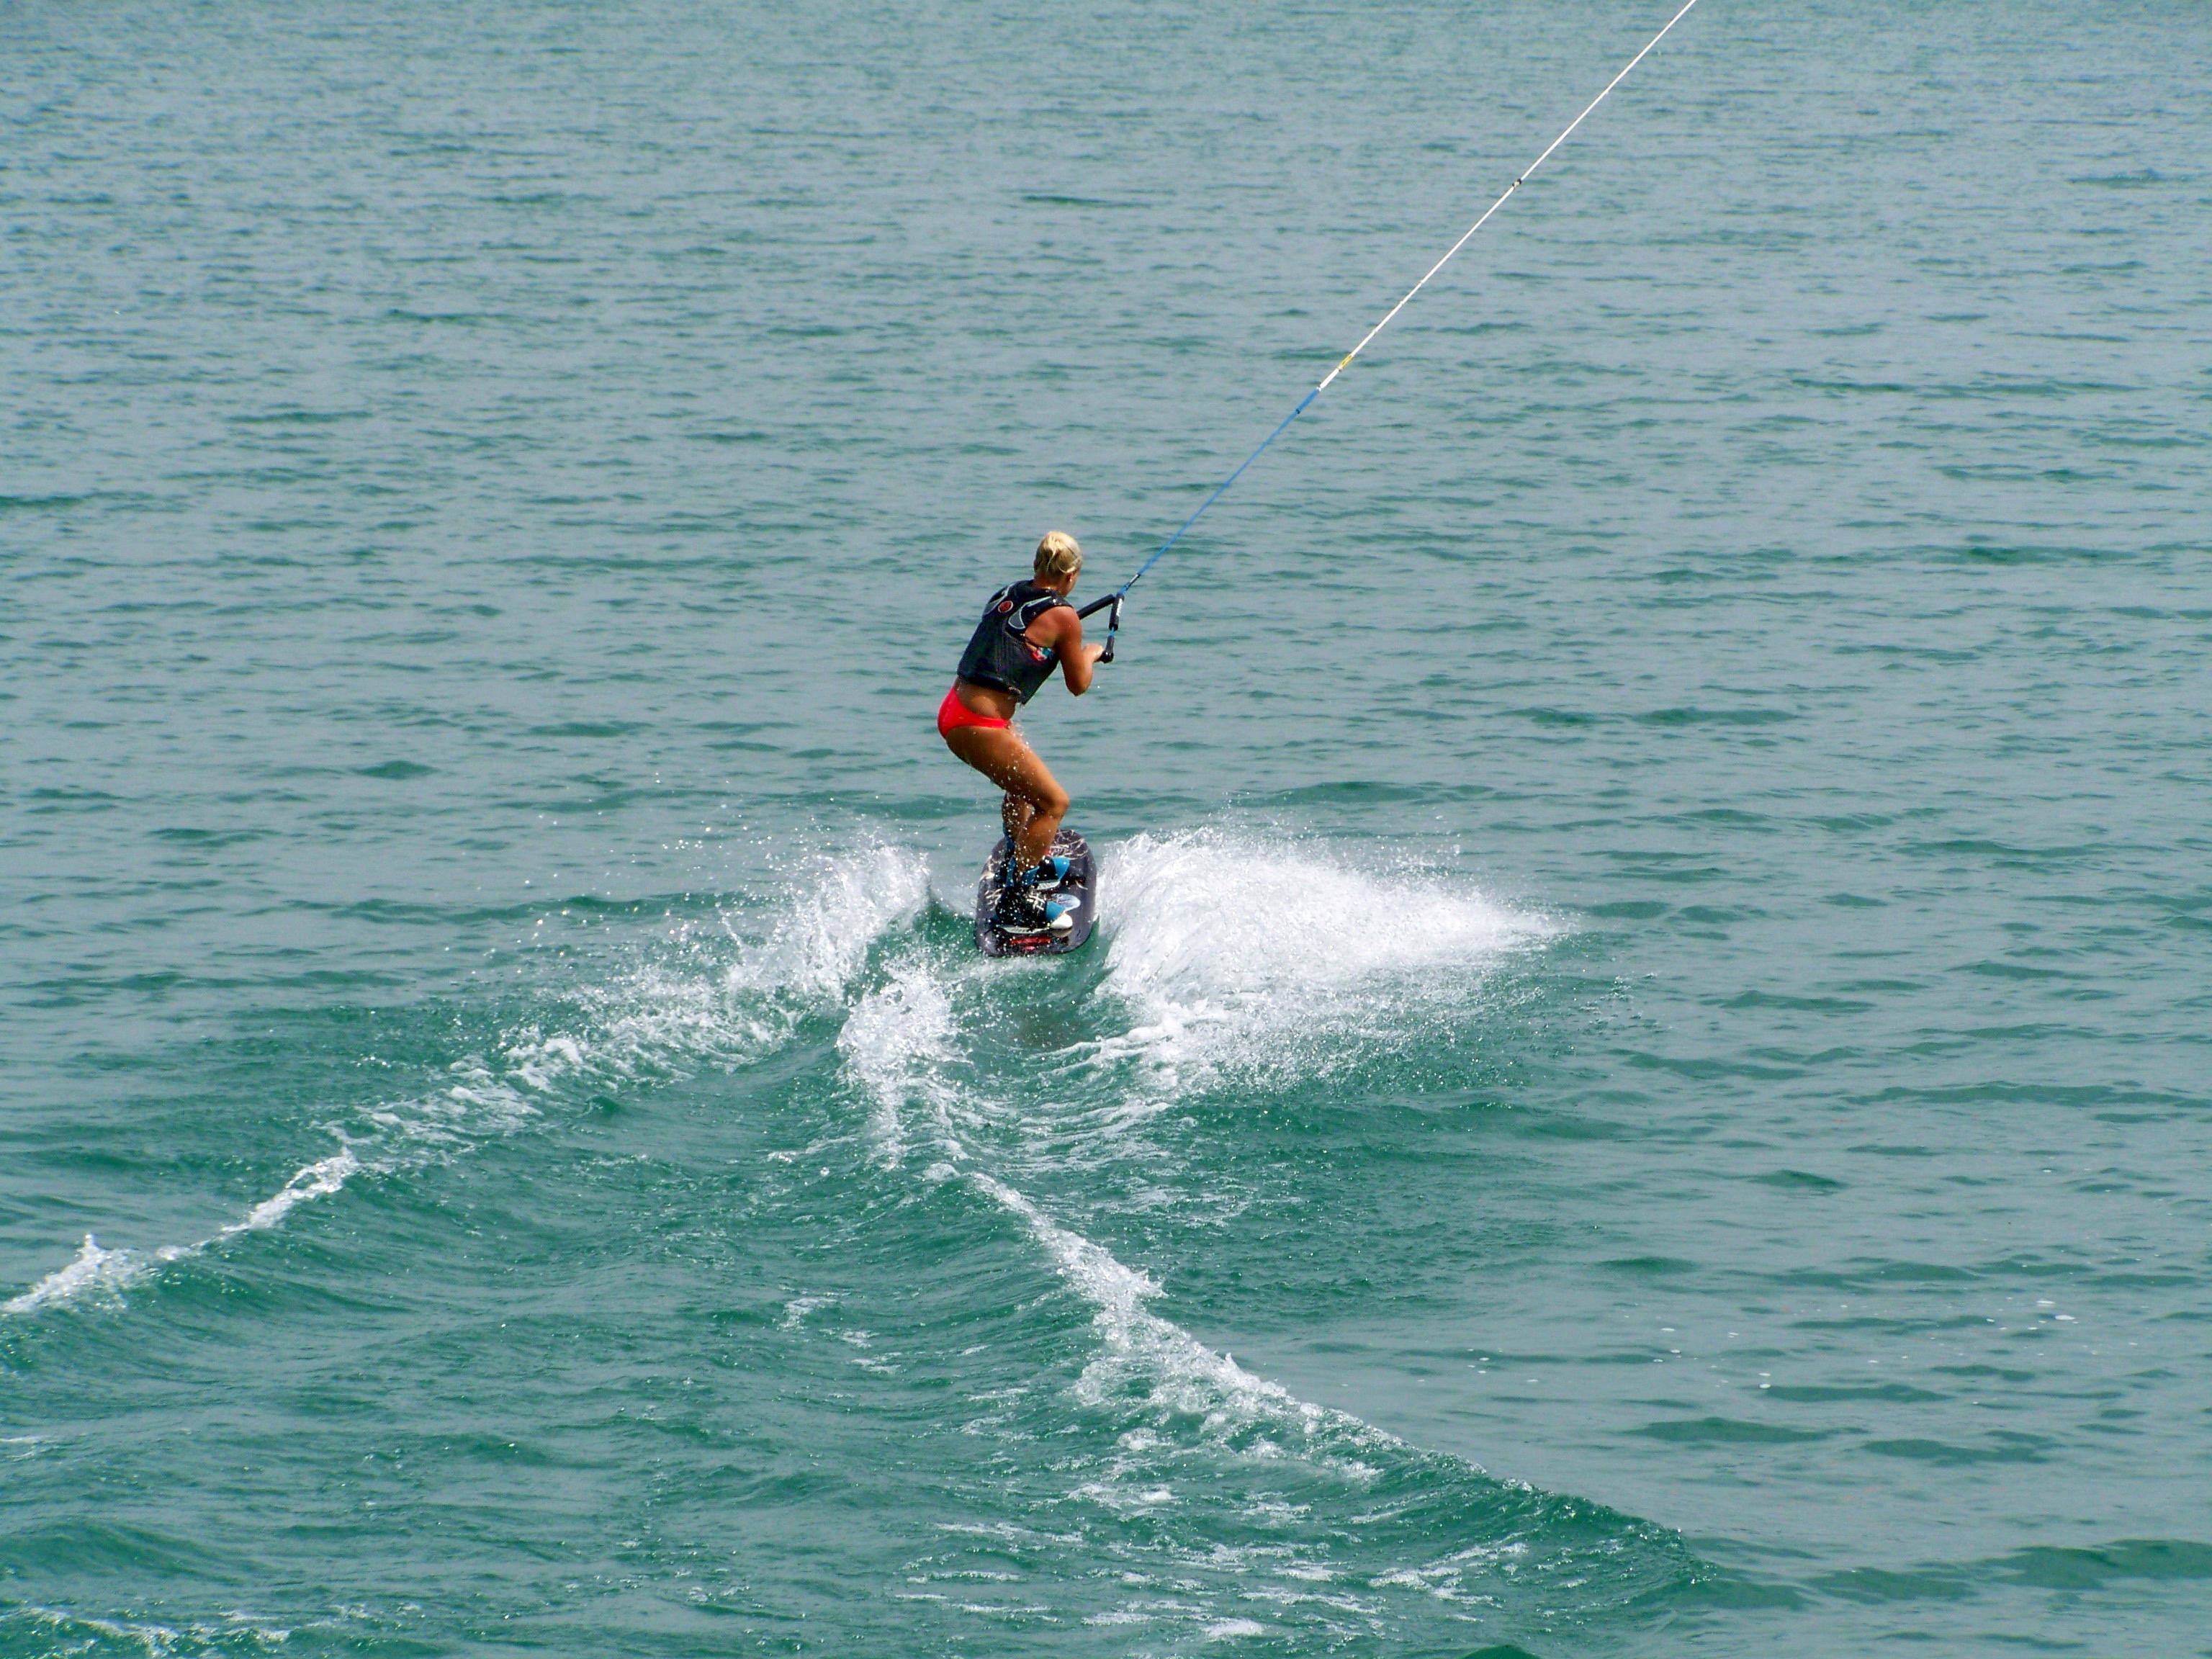 Woman Waterboarding On Lake Image Free Stock Photo